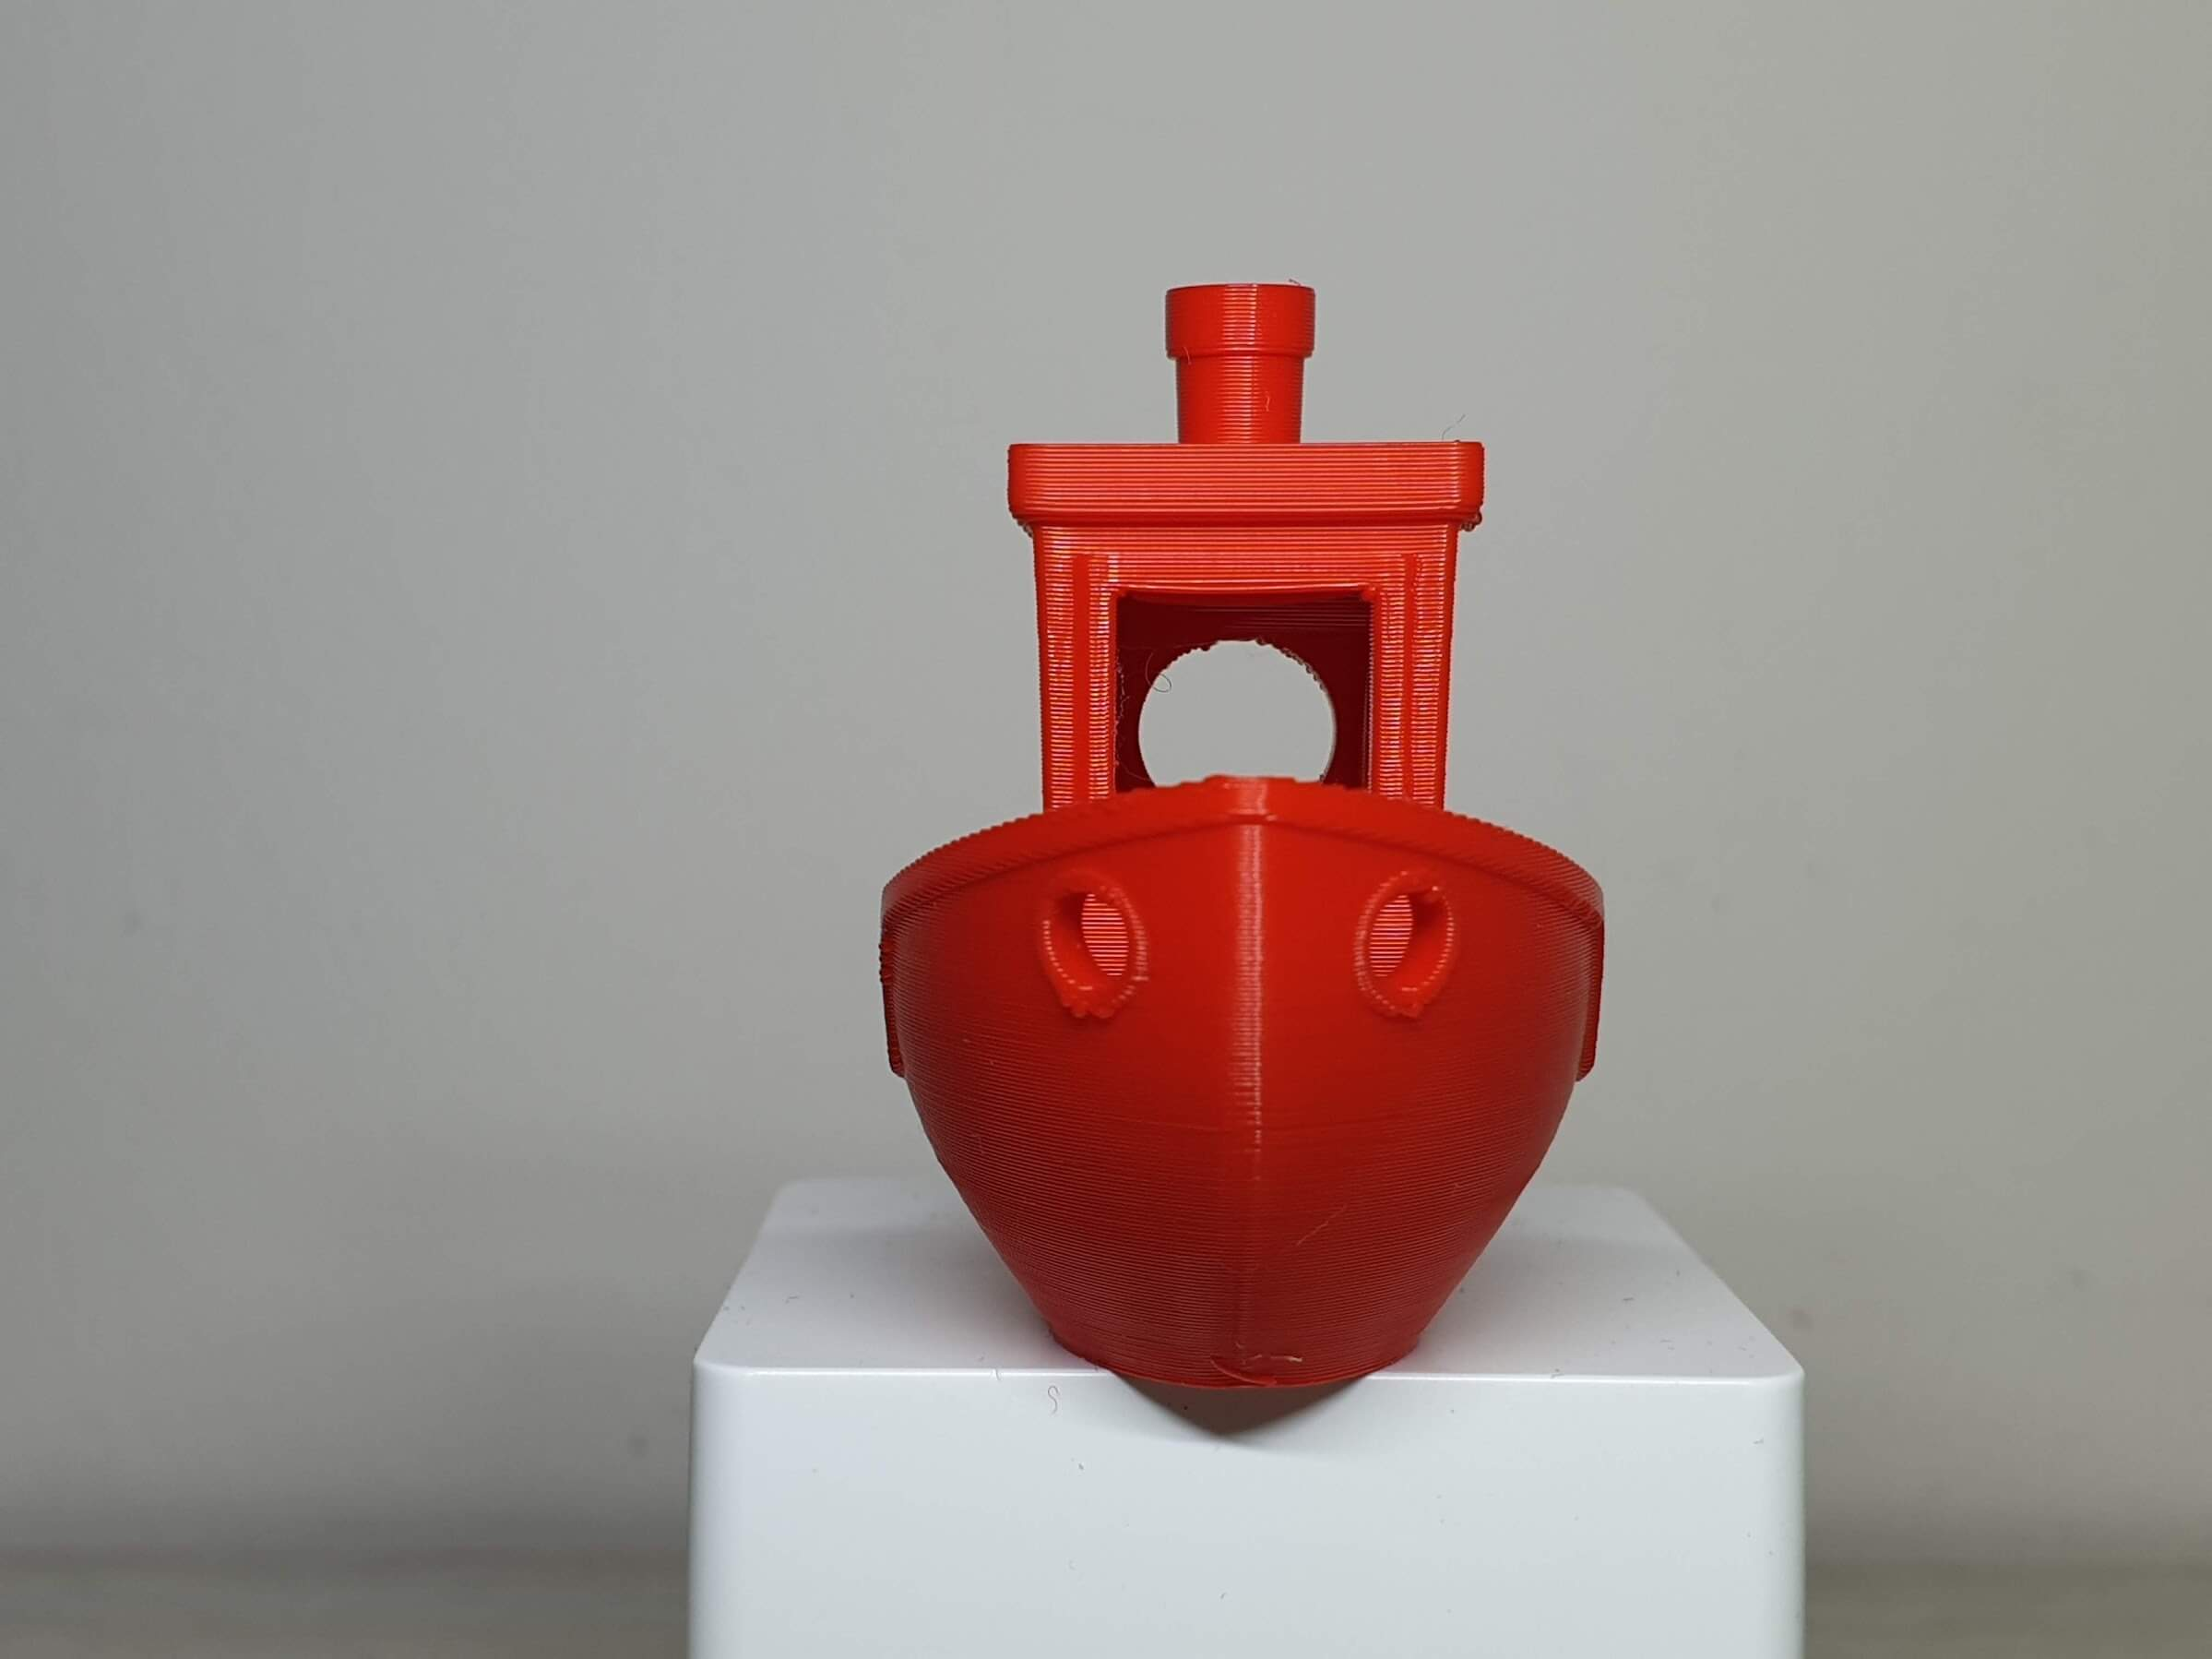 BIQU-B1-3D-Benchy-print-test-4